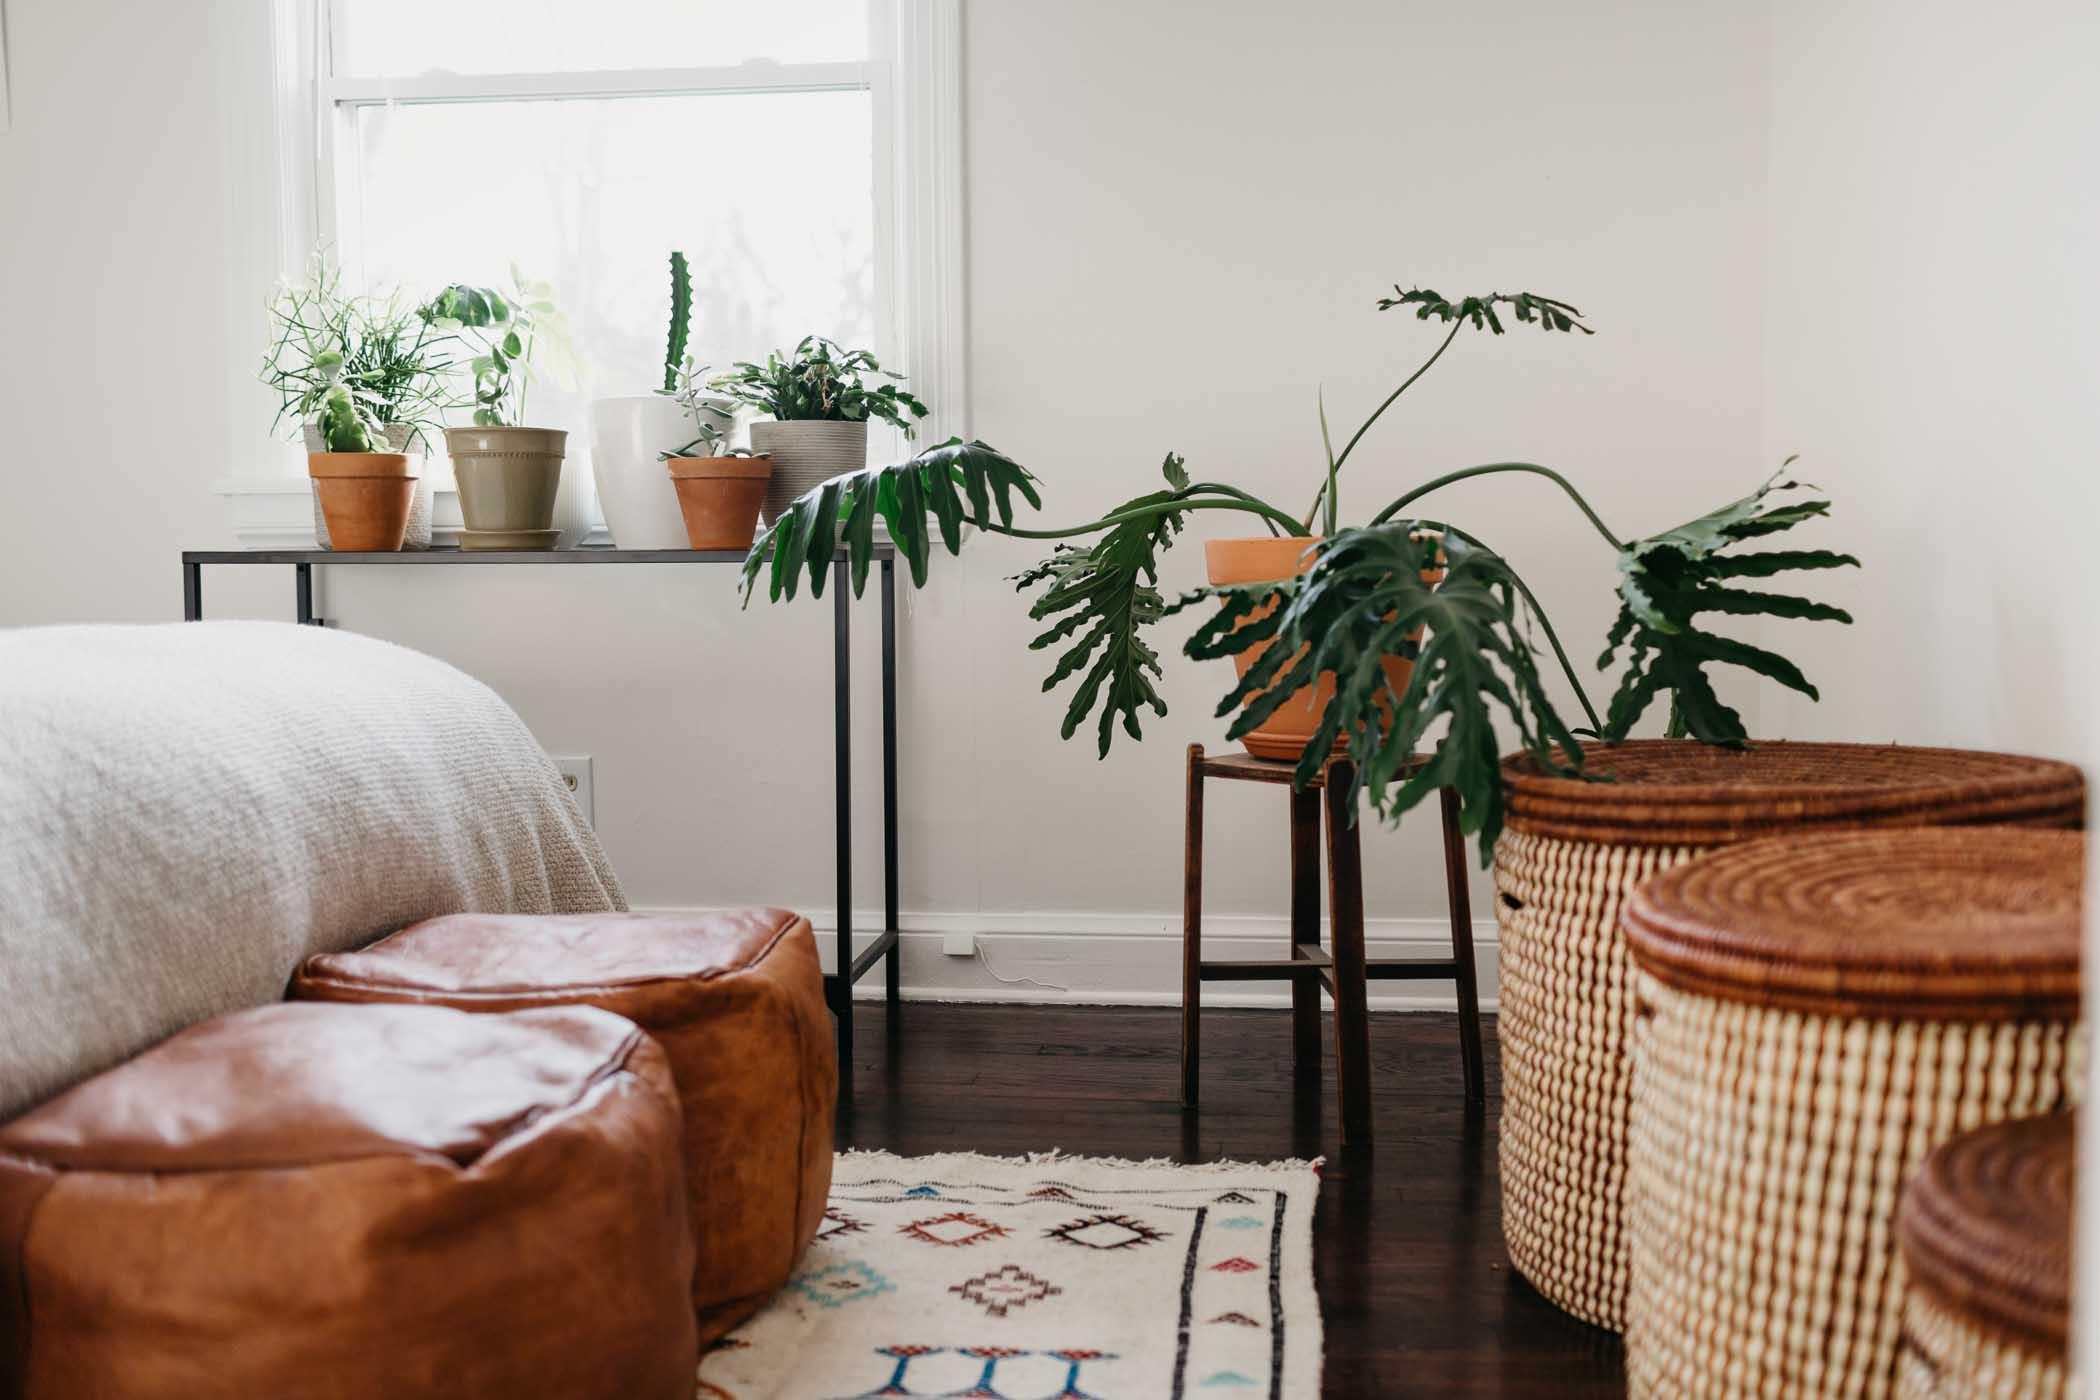 cozy-casa-nashville-tn-natural-light-studio-photography-ideas-lifestyle-photographer-photography-2.jpg